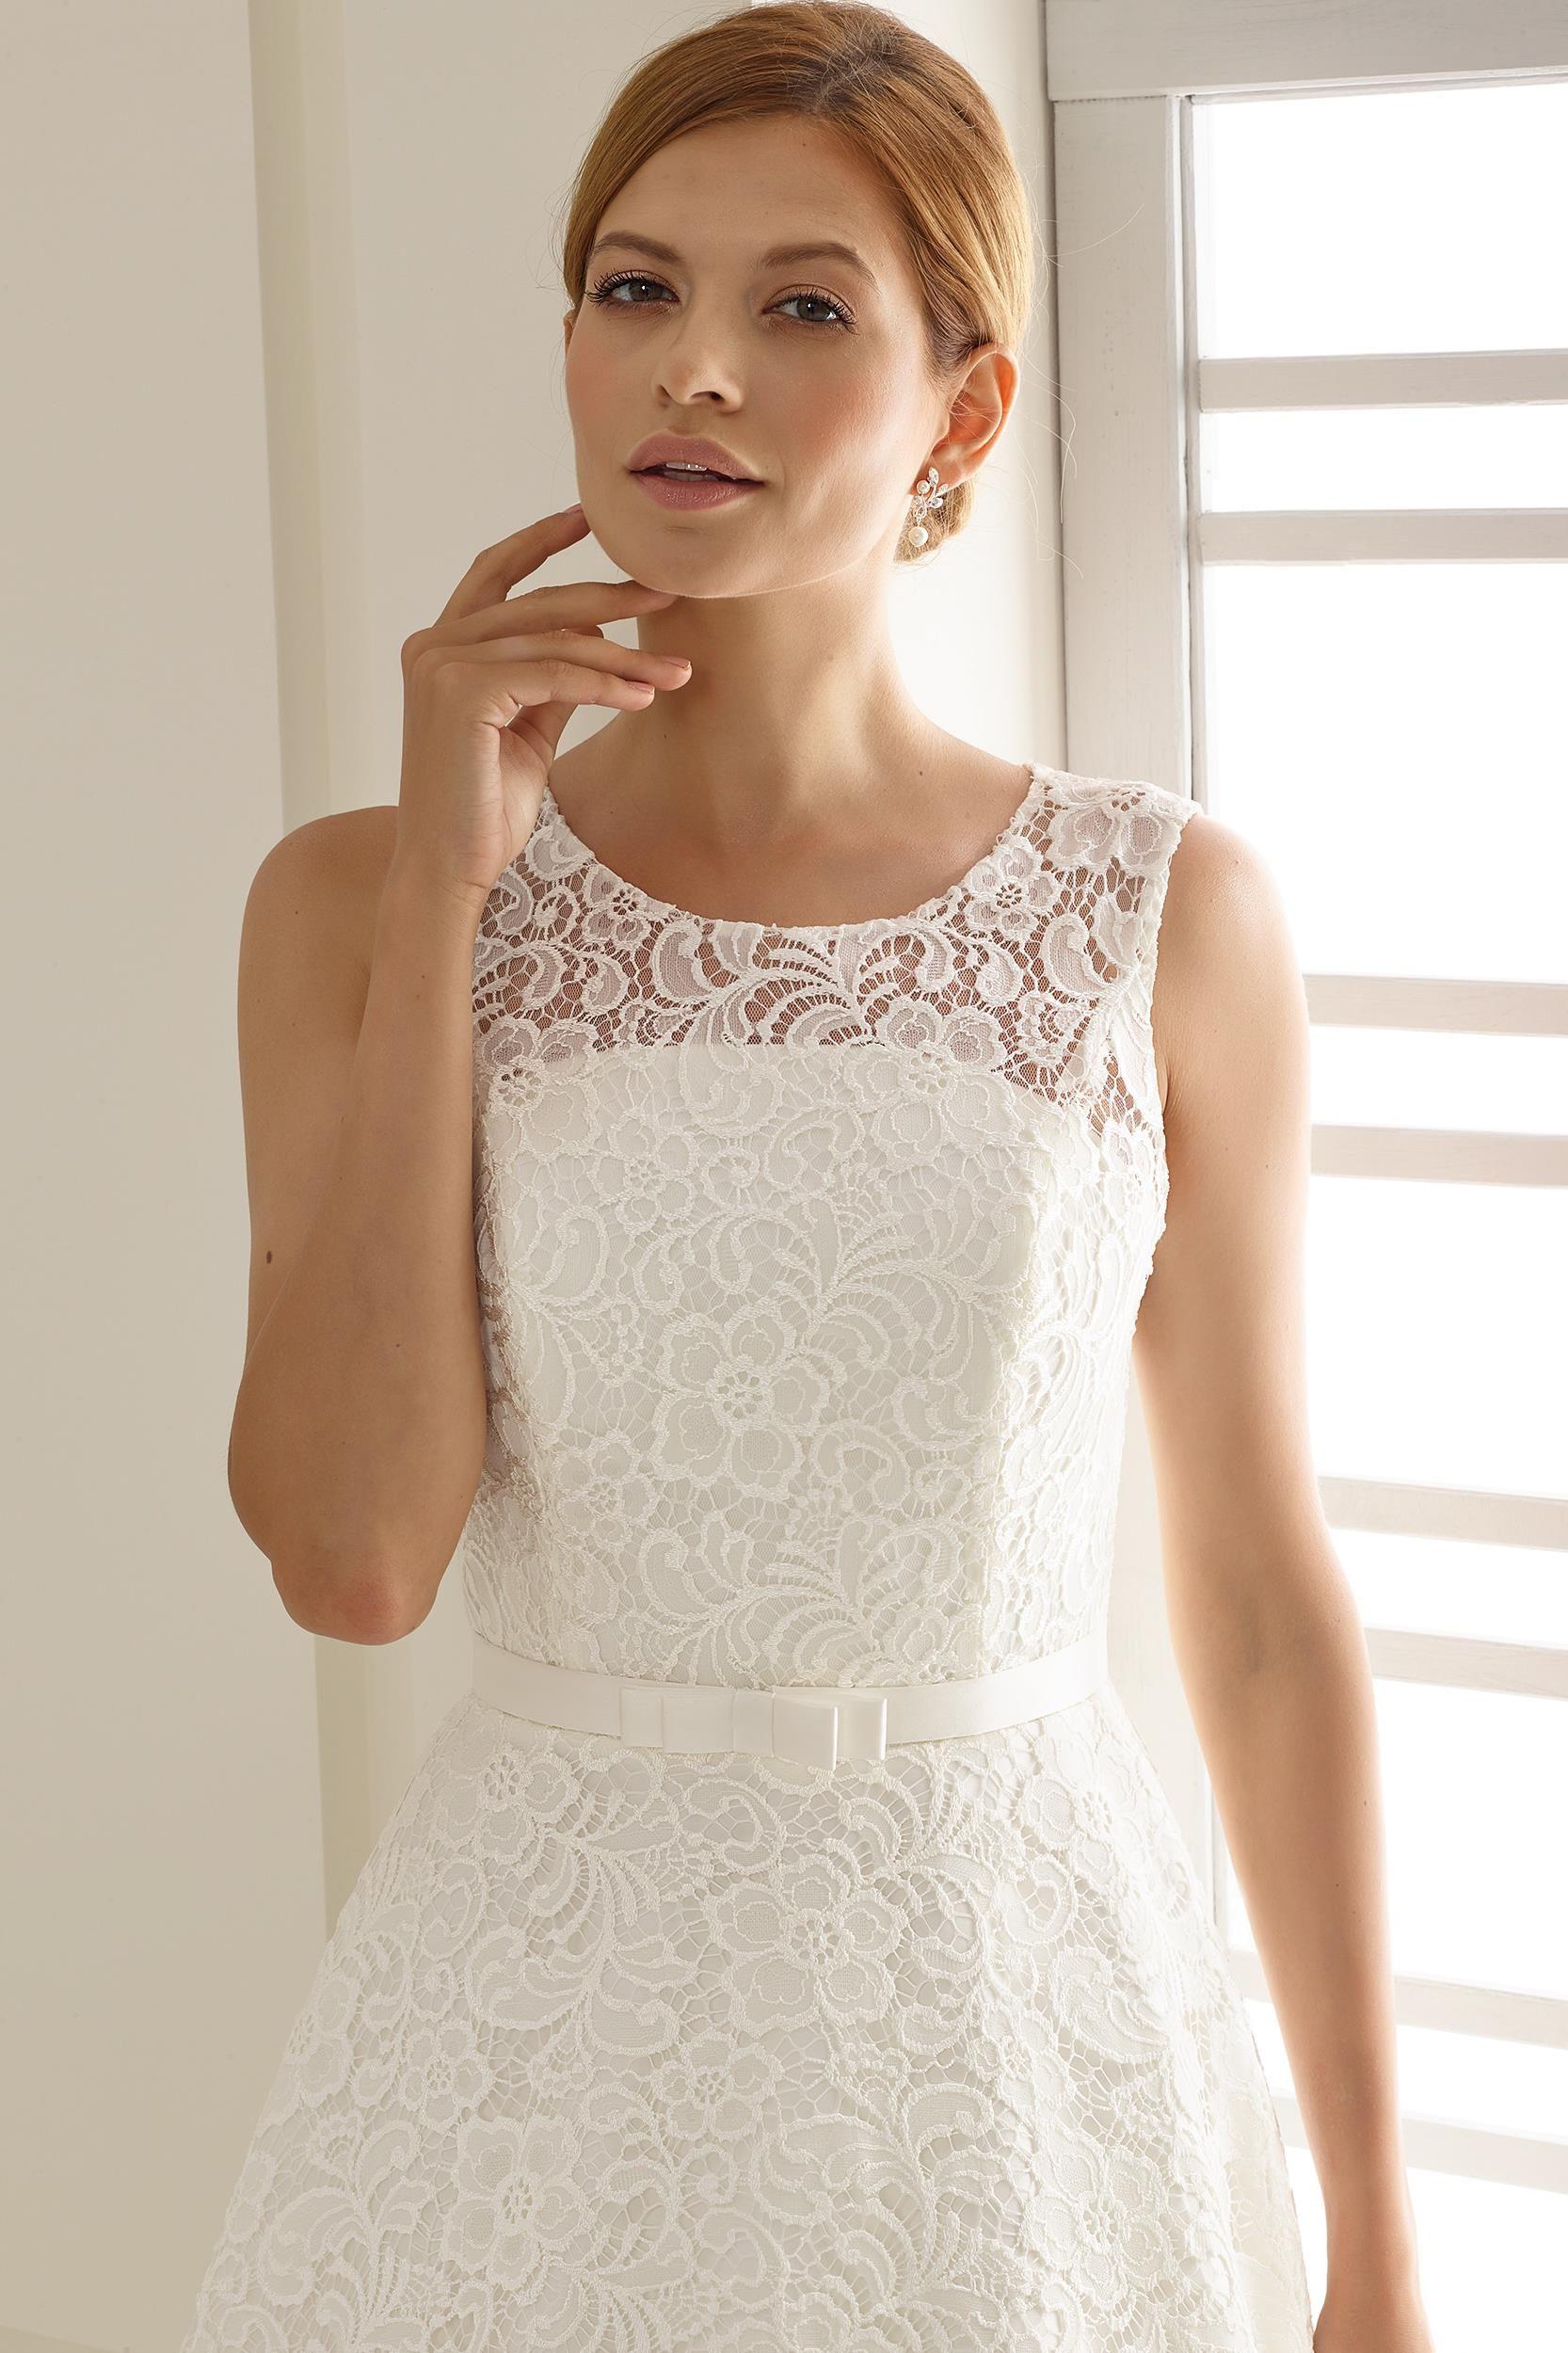 Siena Wedding Dress From Bianco Evento Hitched Co Uk In 2020 Short Bridal Dress Wedding Dresses Tea Length Wedding Dress